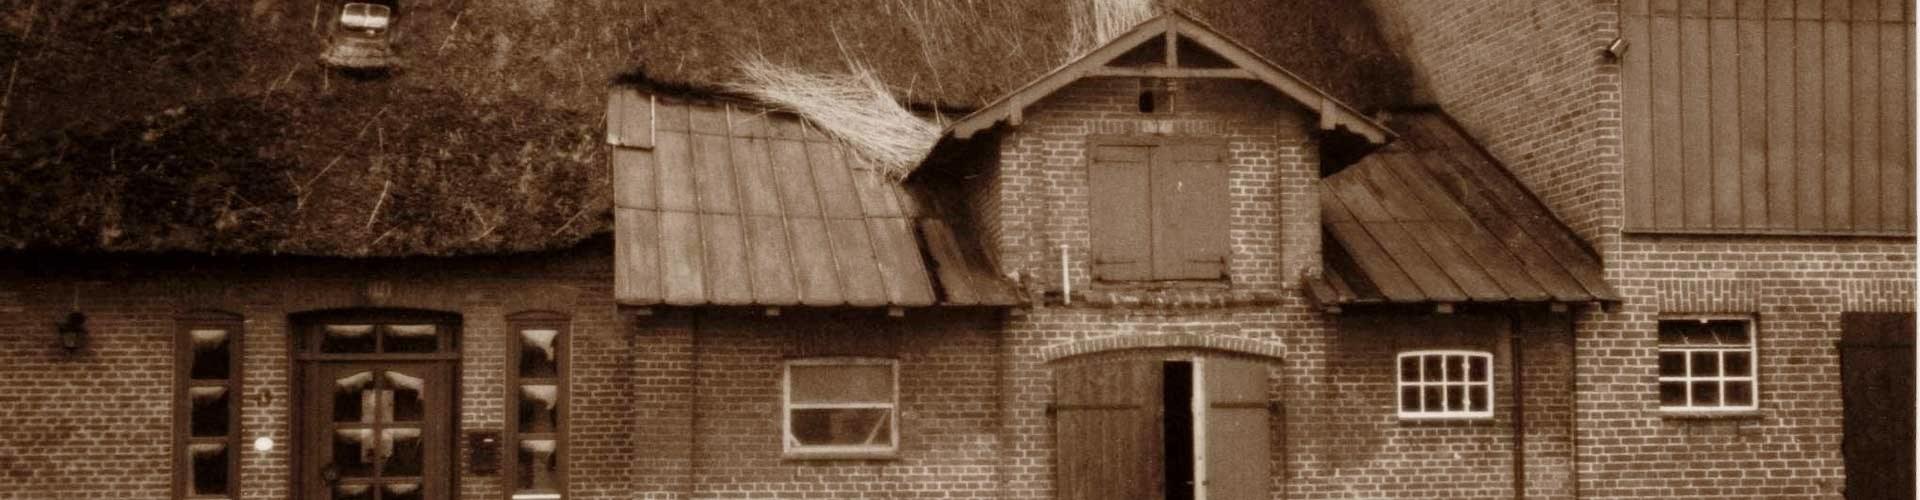 Geschichte Thomsens Farm